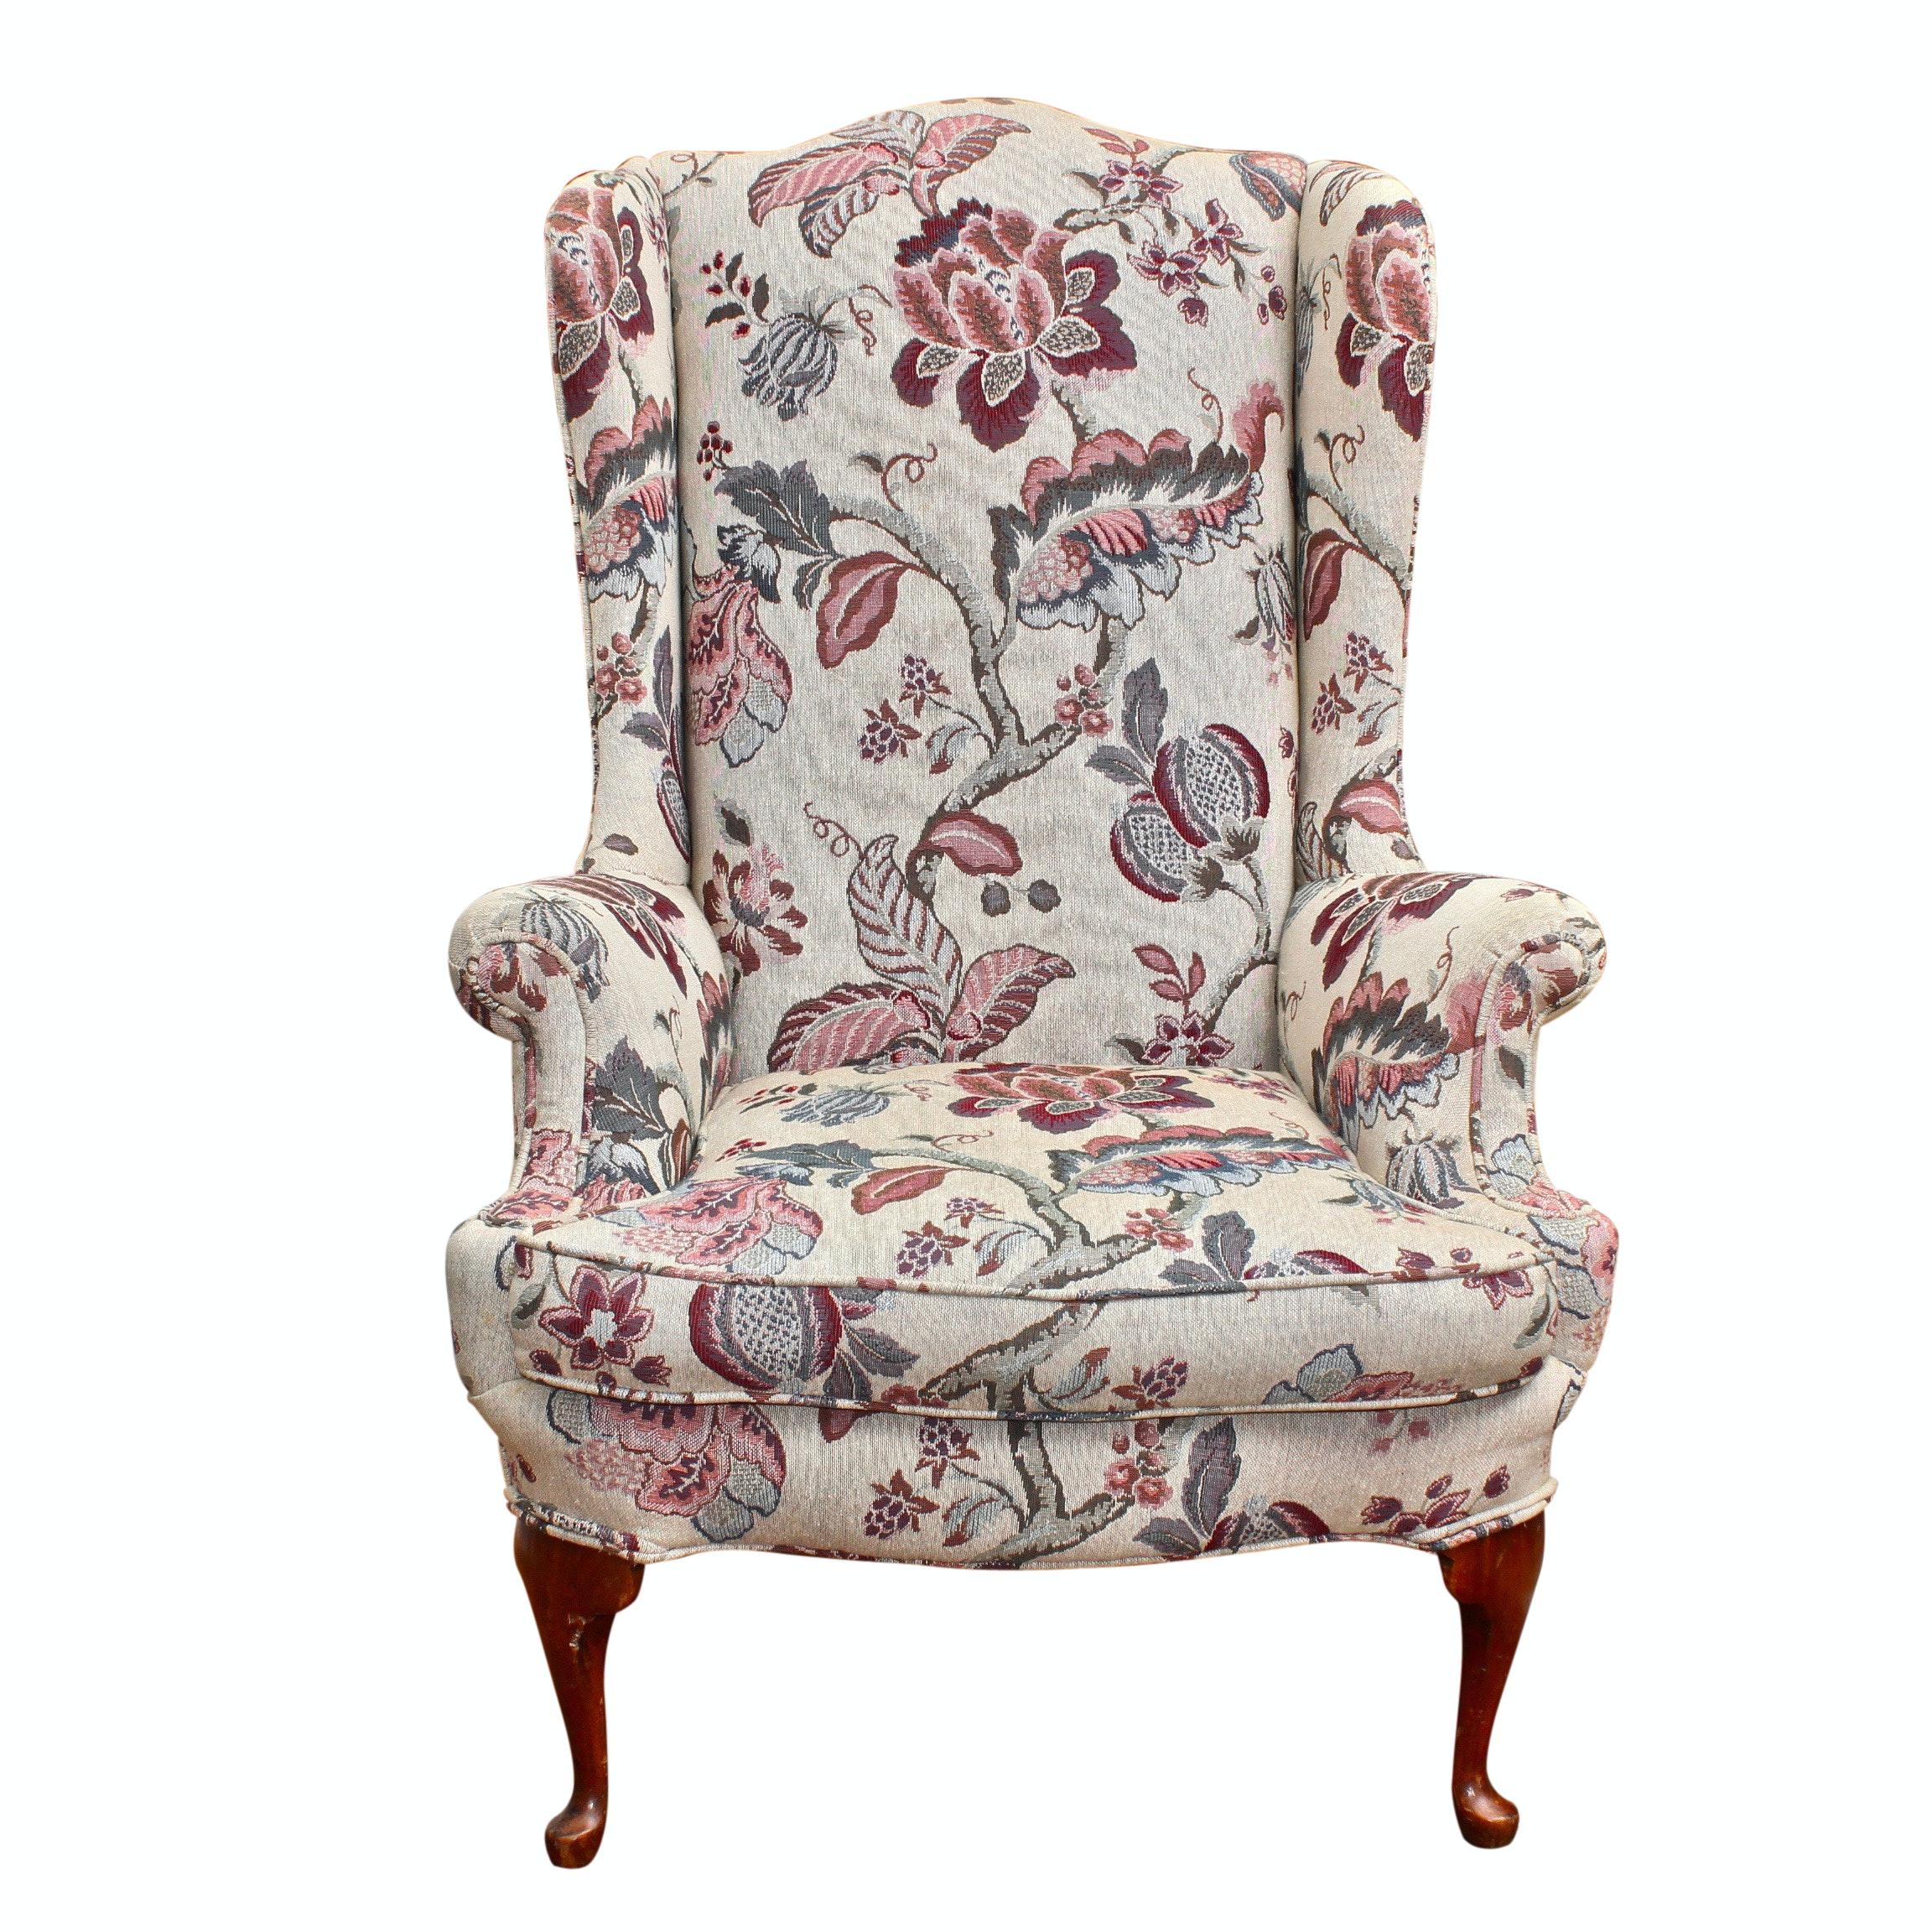 Queen Anne Wingback Arm Chair, 20th Century